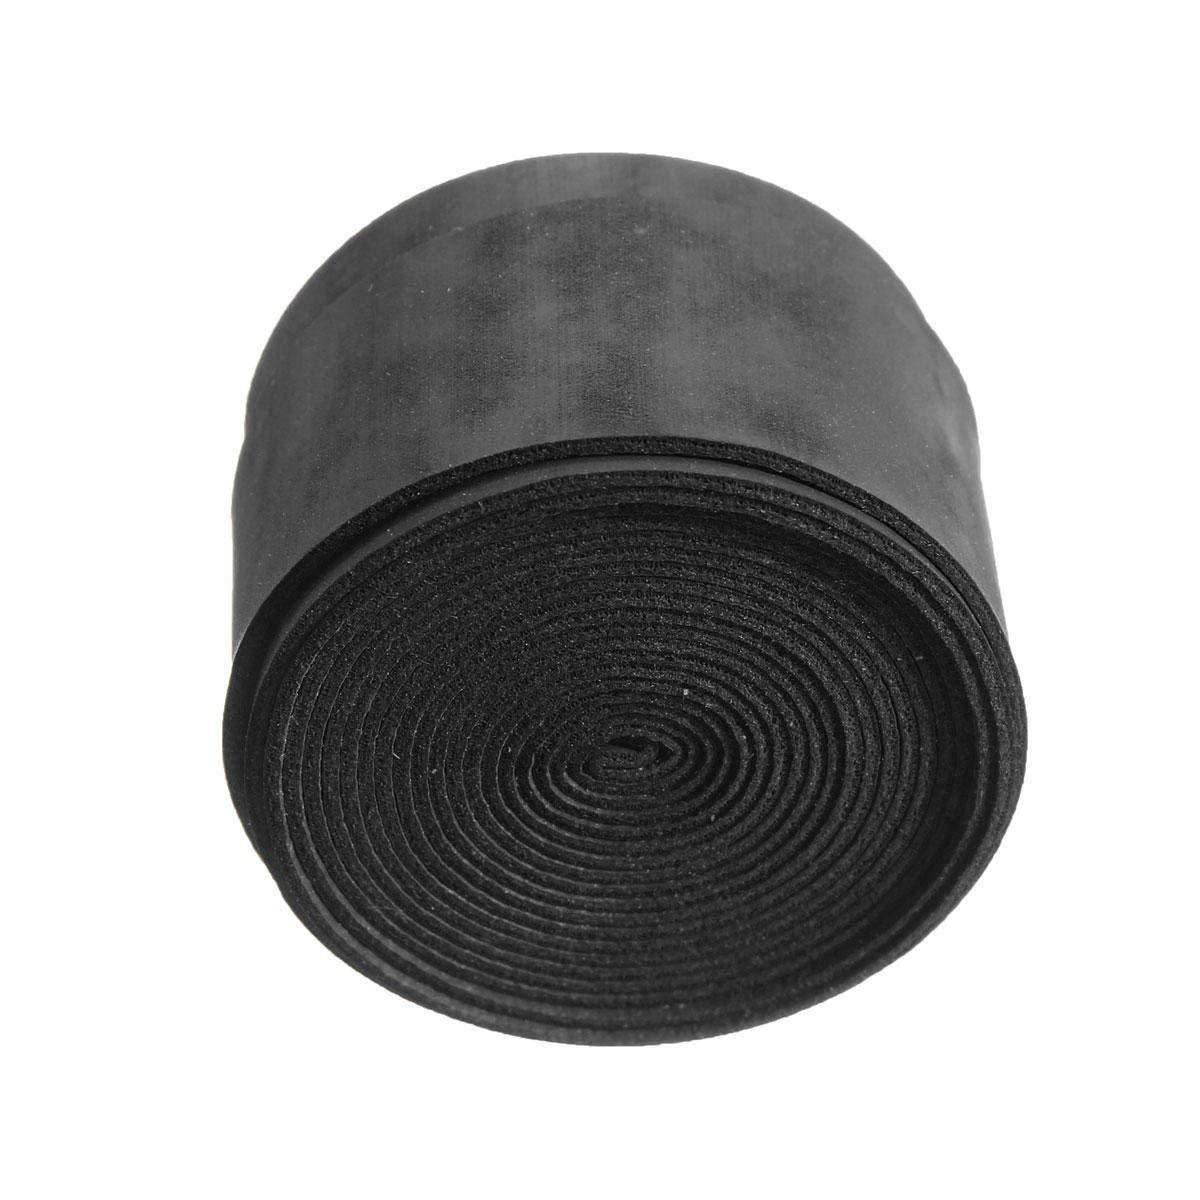 25×1100×0.75mm Anti Slip Tennis Racket Grip Tapes Badminton Racket Squash Tape - Tapes, Adhesives & Sealants Adhesive Tapes - (Black) - 2 X Badminton/Tennis Grip